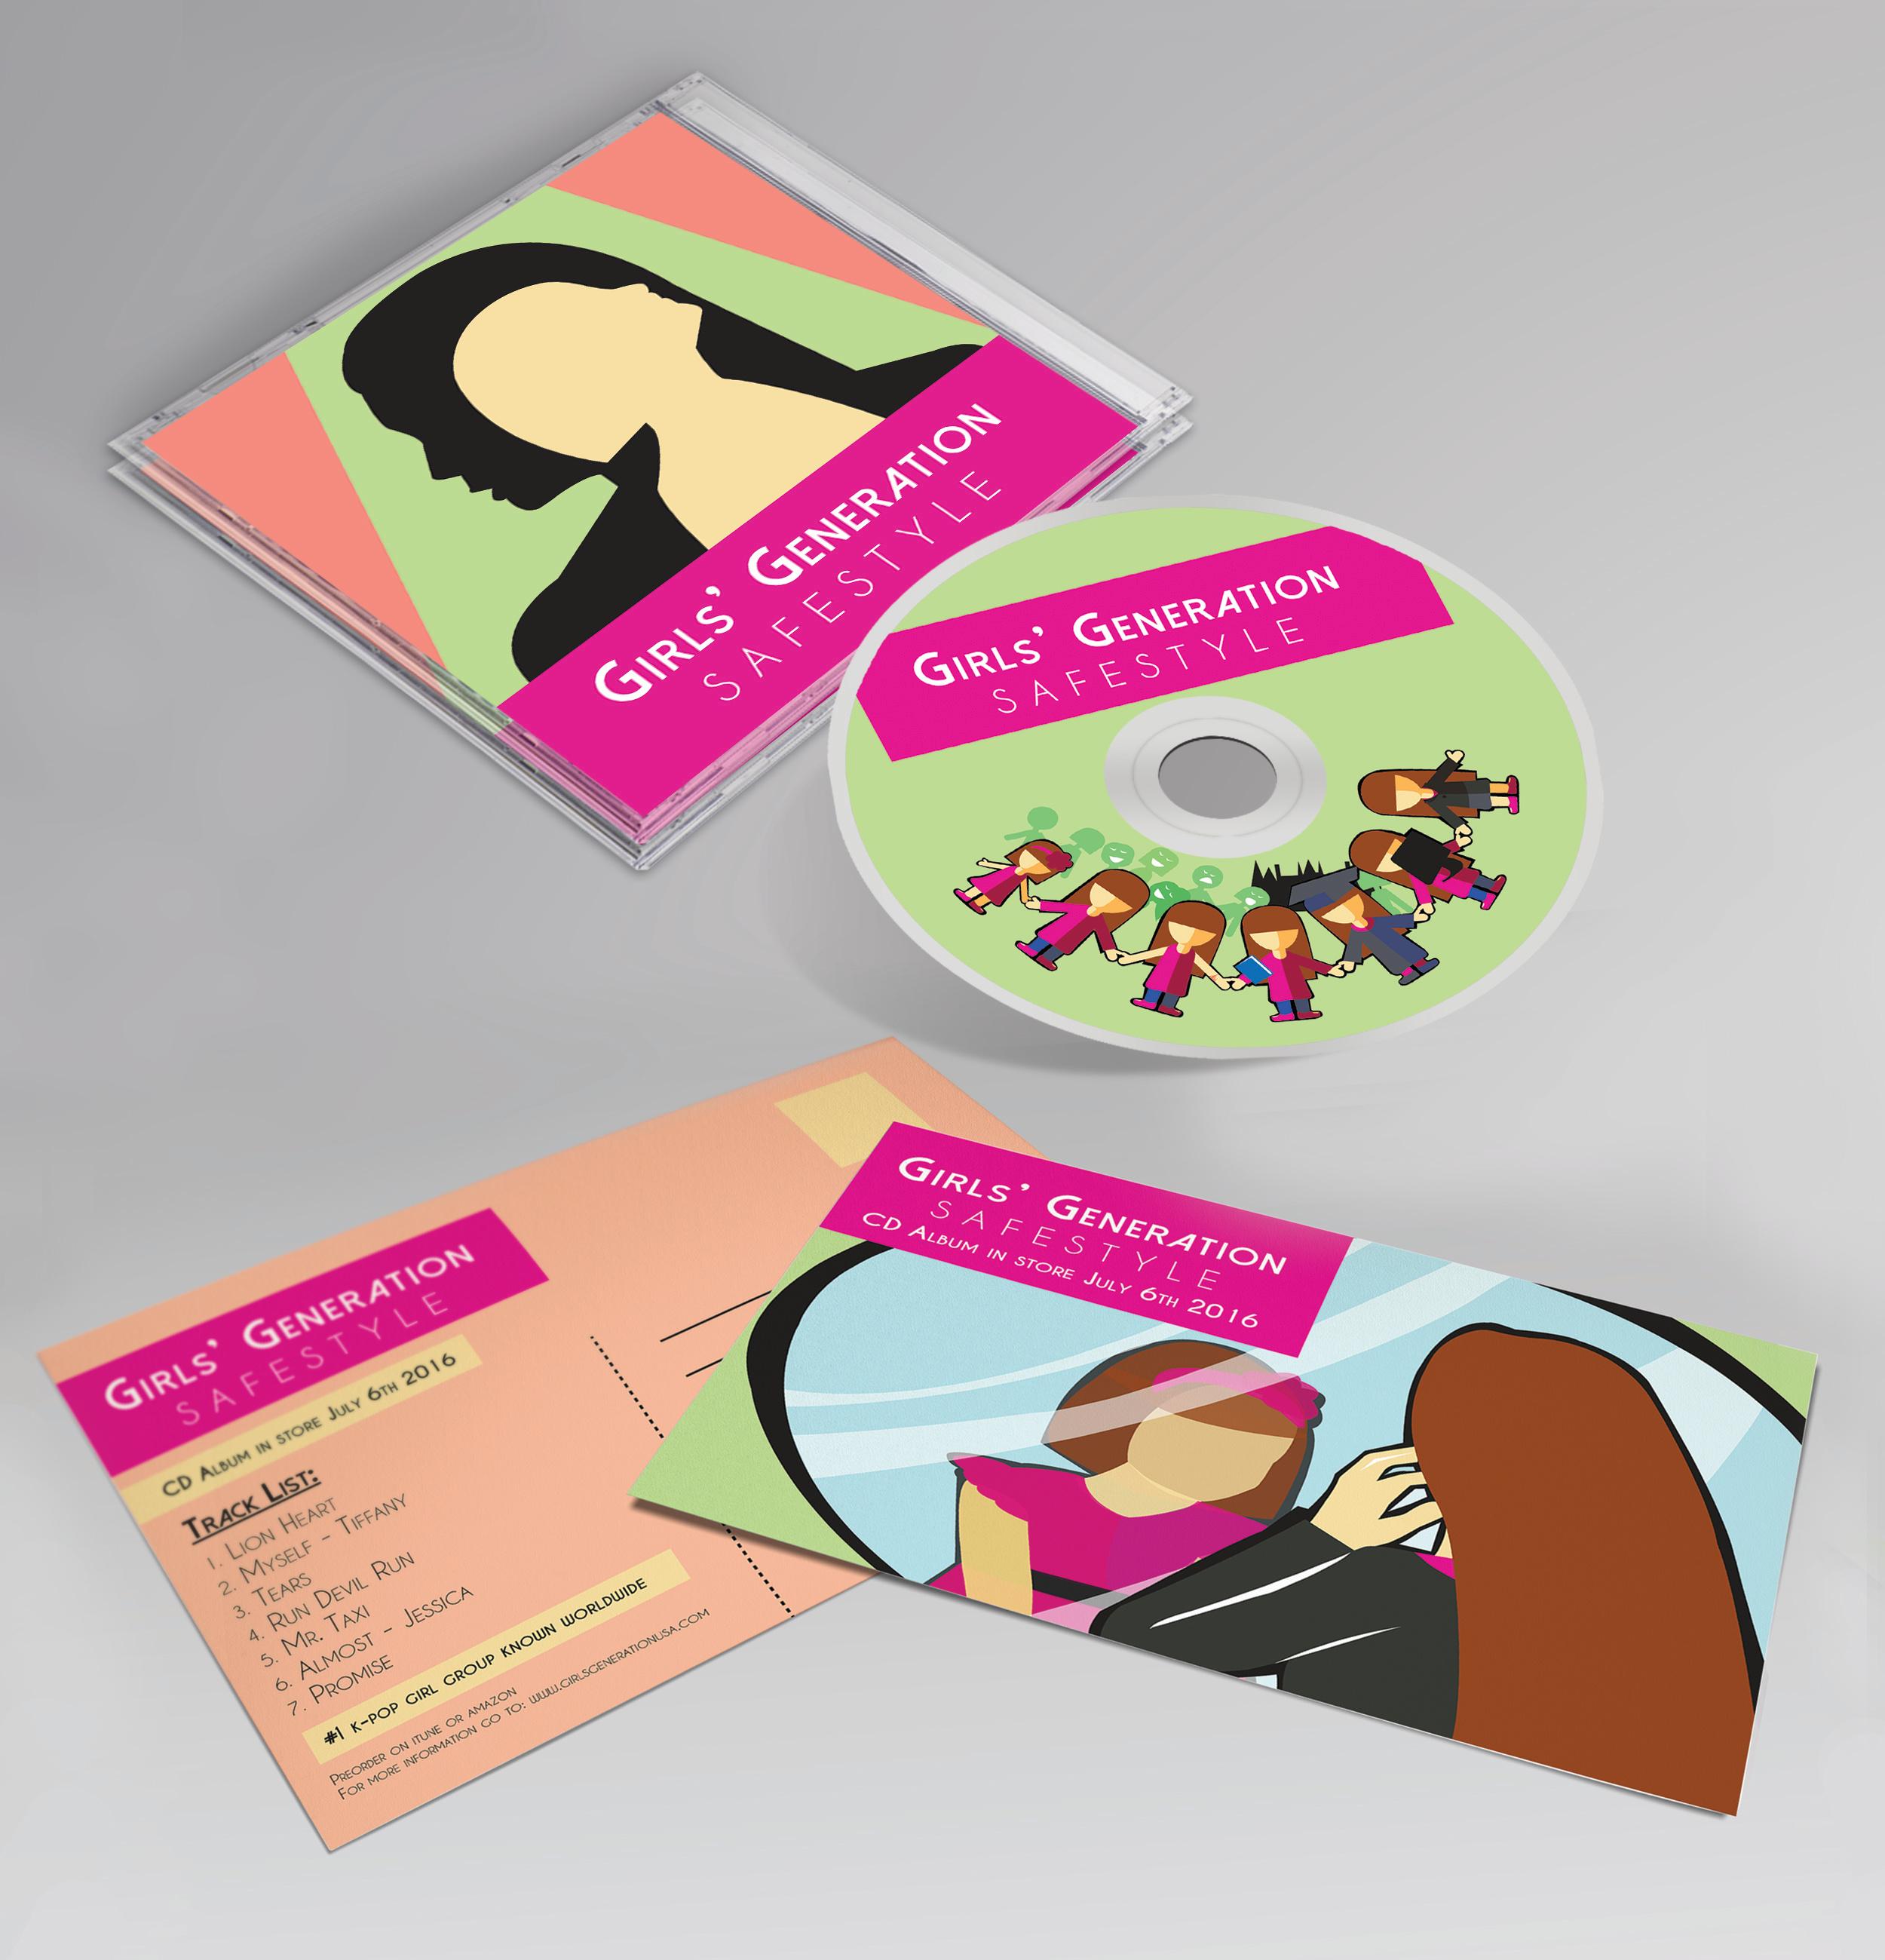 GG: SafeStyle - album Campaign